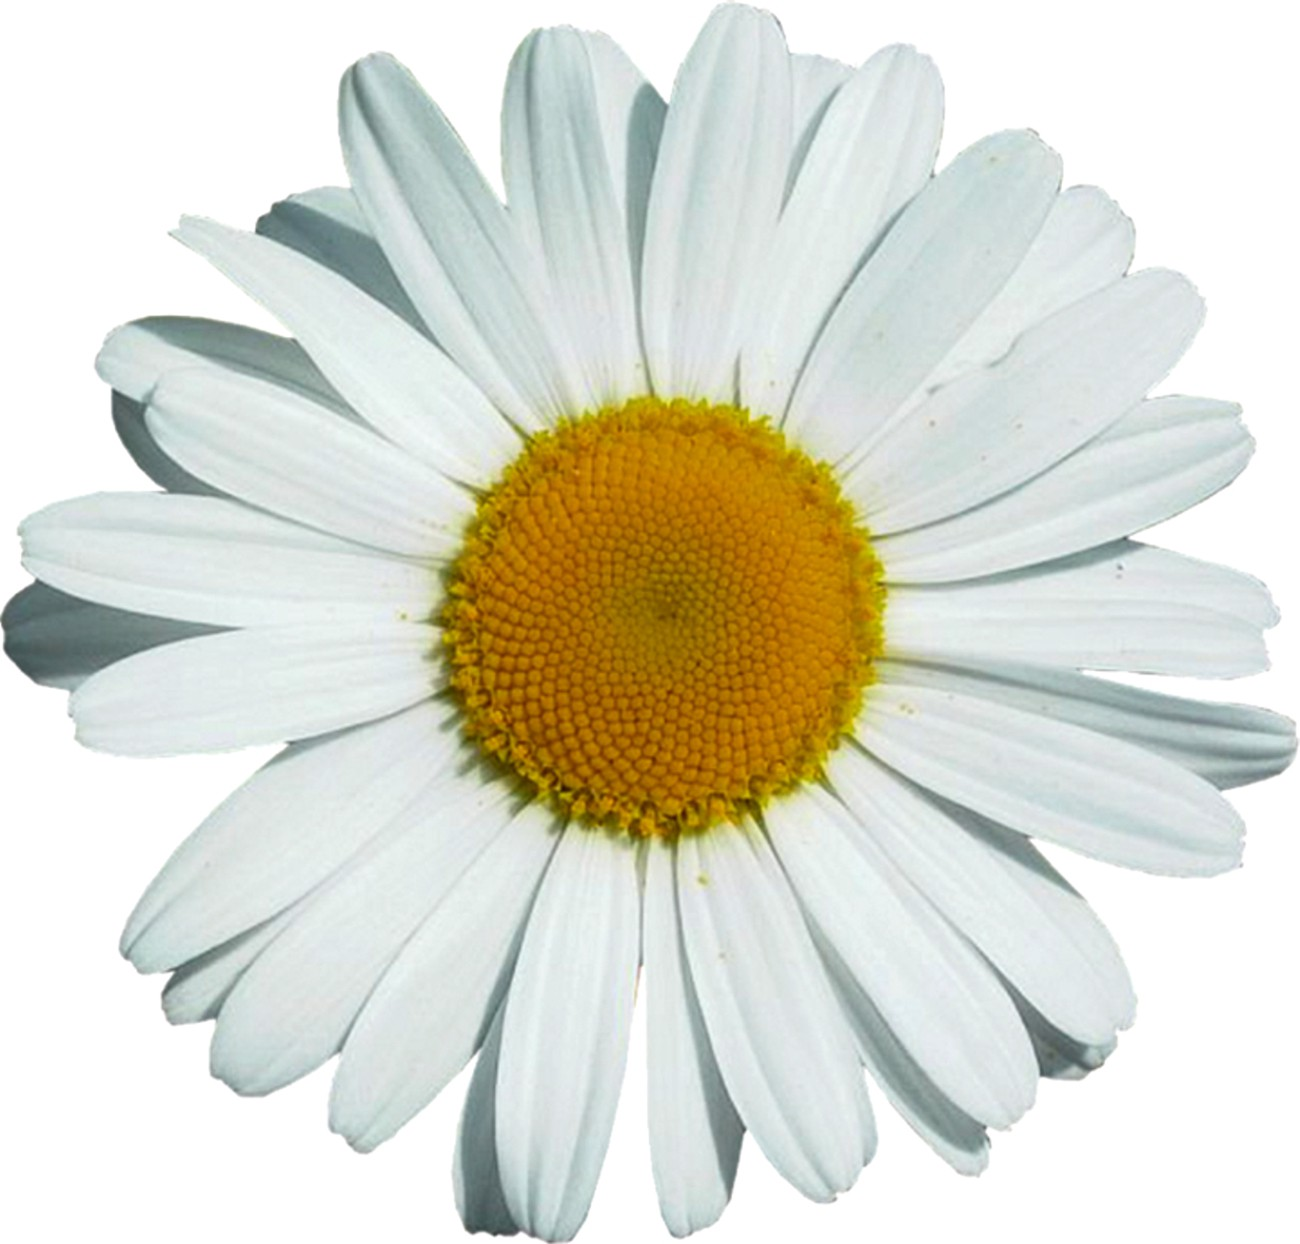 Aufkleber Margeritenblüte 300 x 300 mm